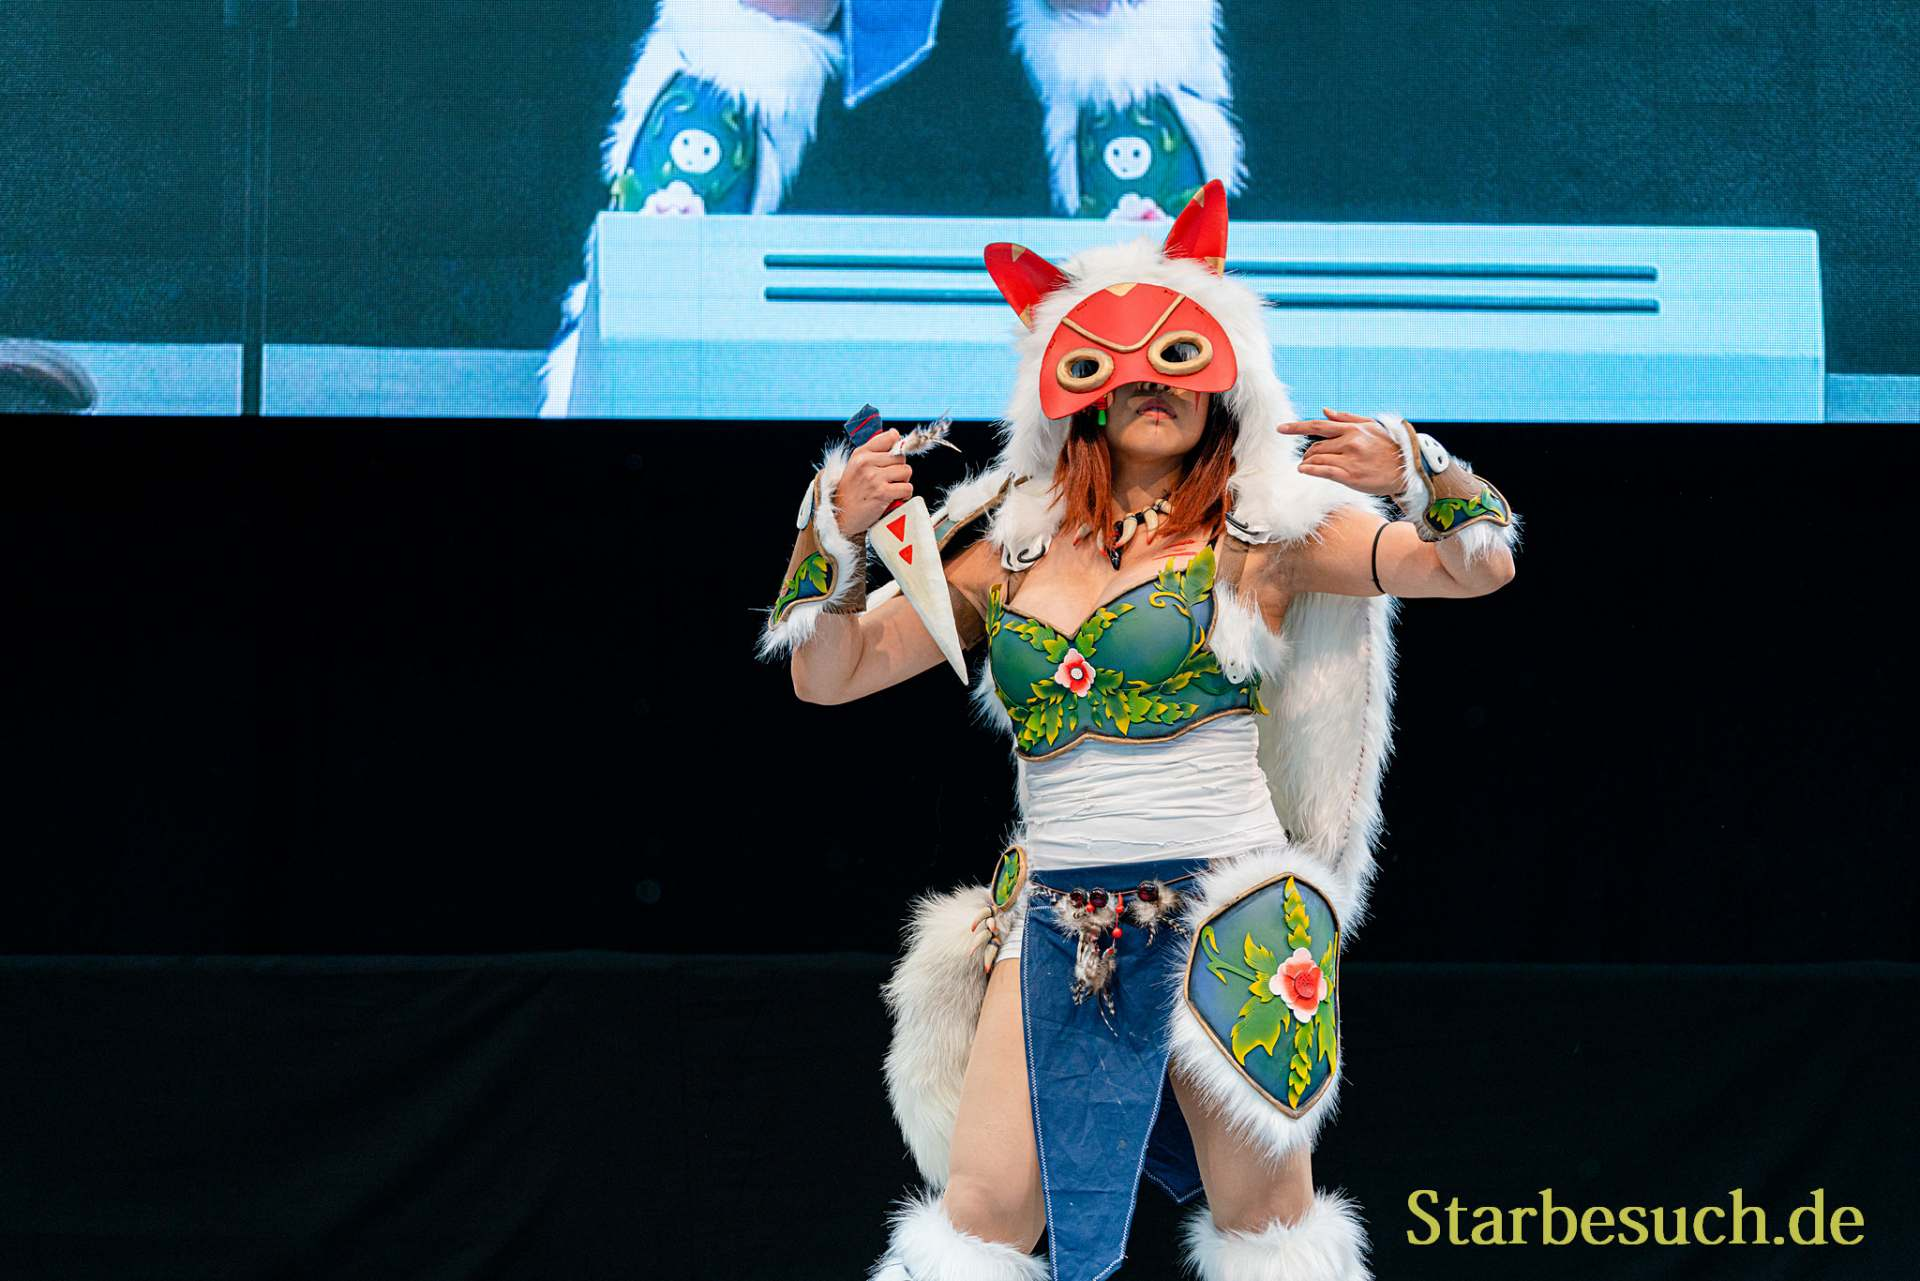 Cosplay Contest #17: Sunnyma Cosplay as Battle Princess Mononoke from Princess Mononoke